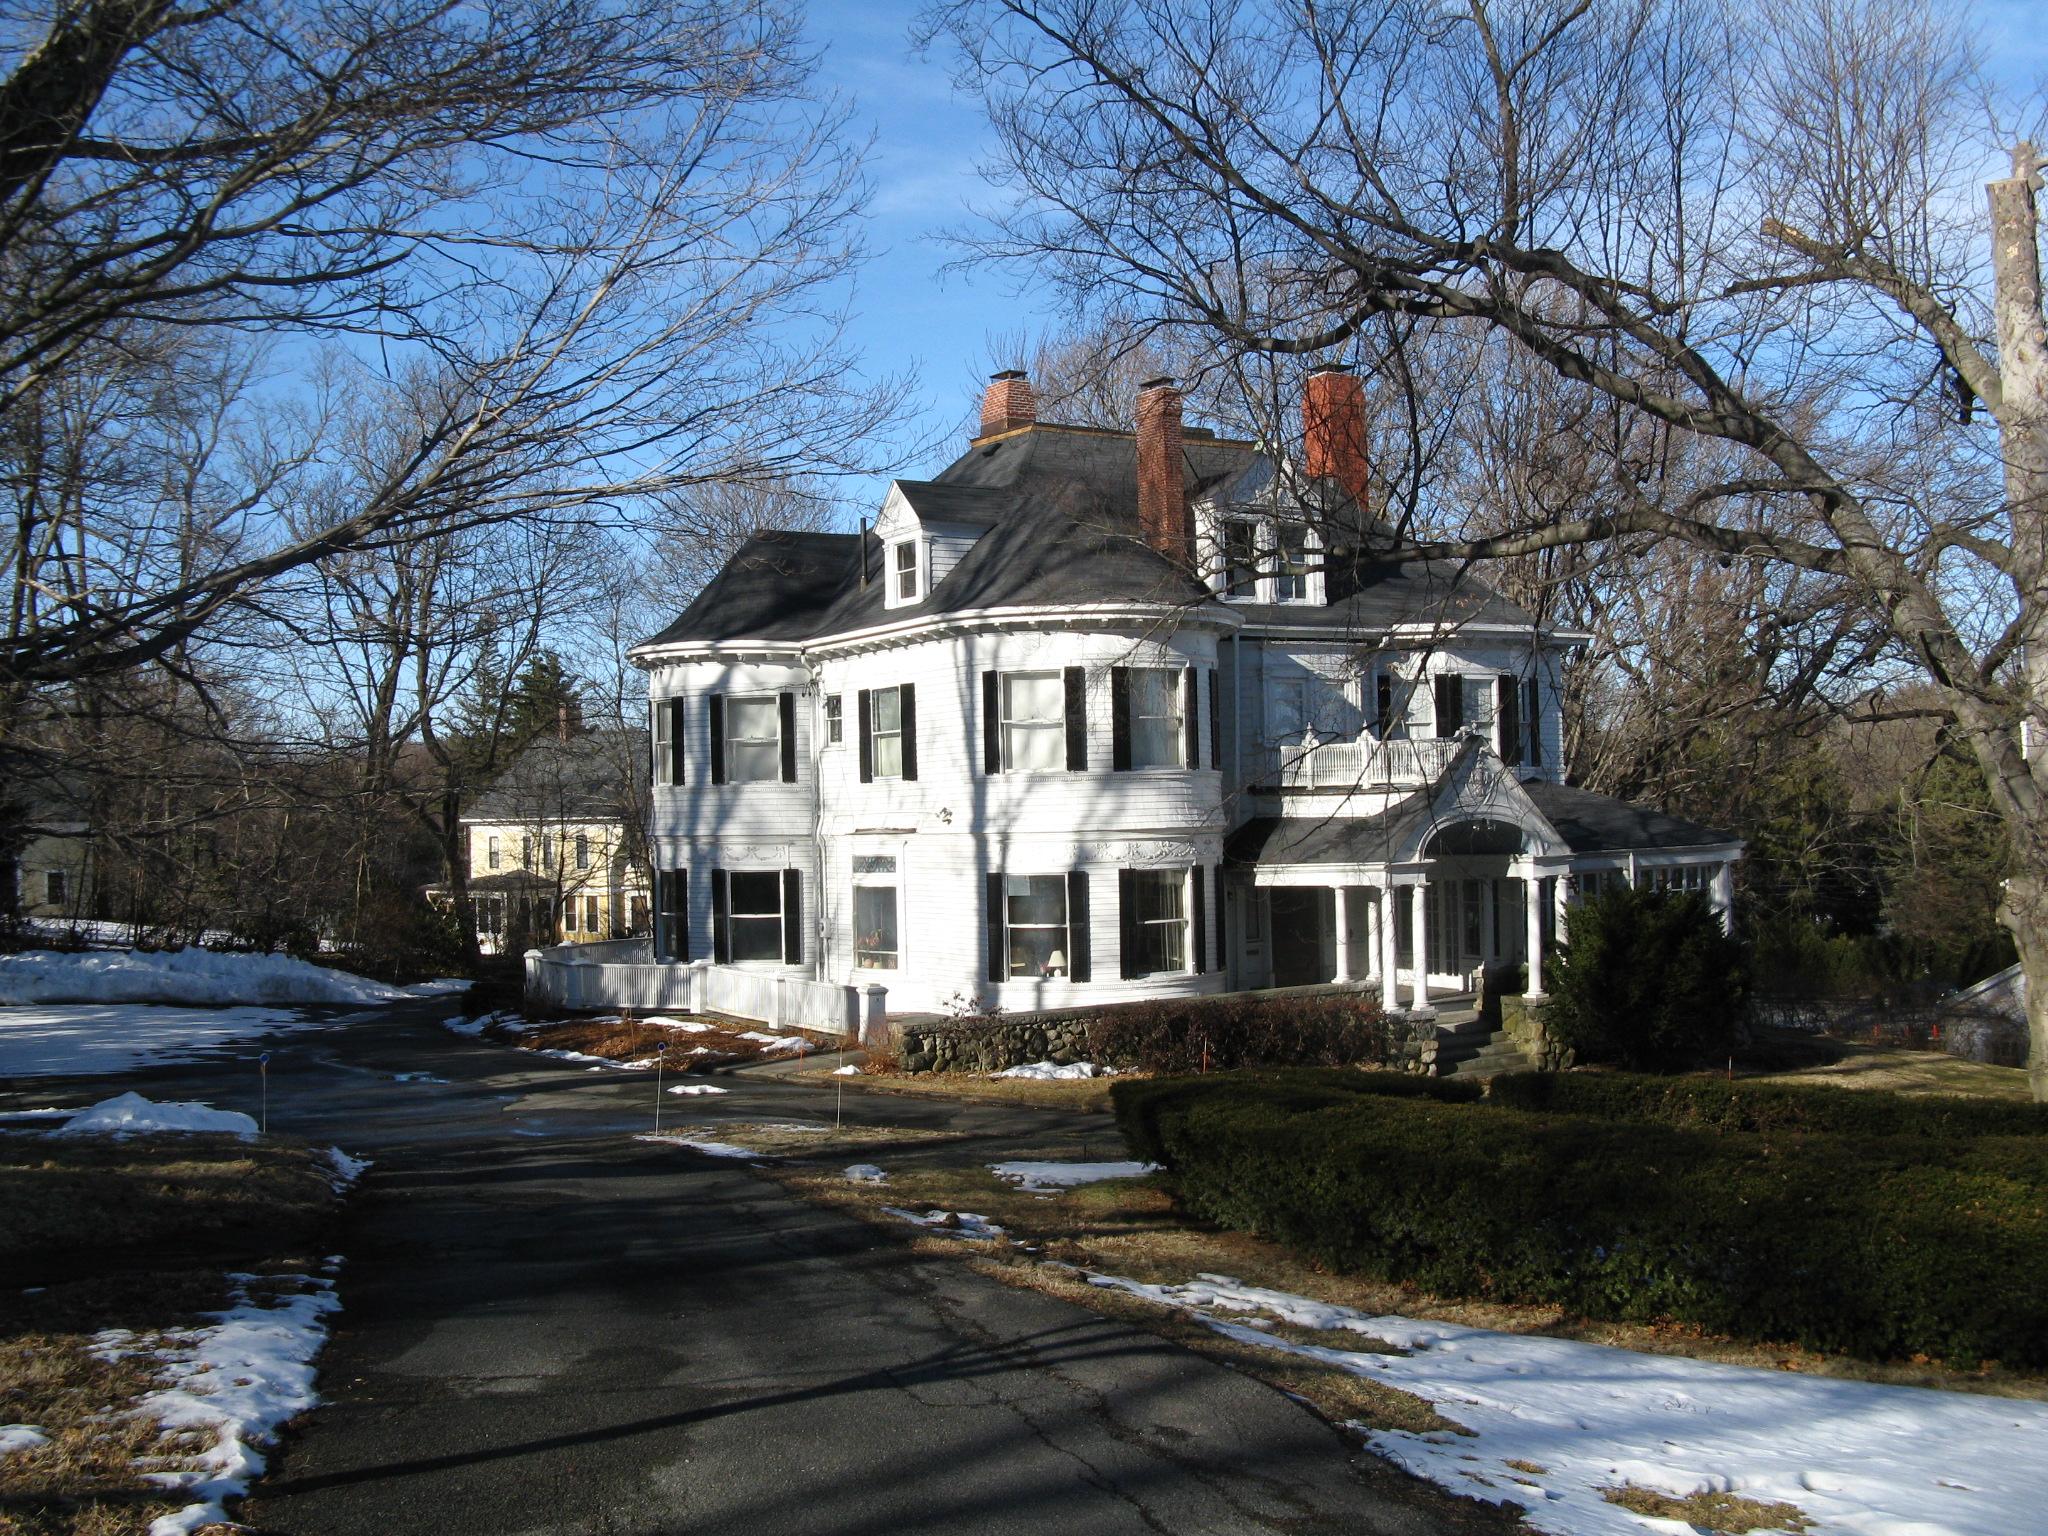 Lexington House Marketing Mail: File:Warren E. Sherburne House, Lexington MA.jpg